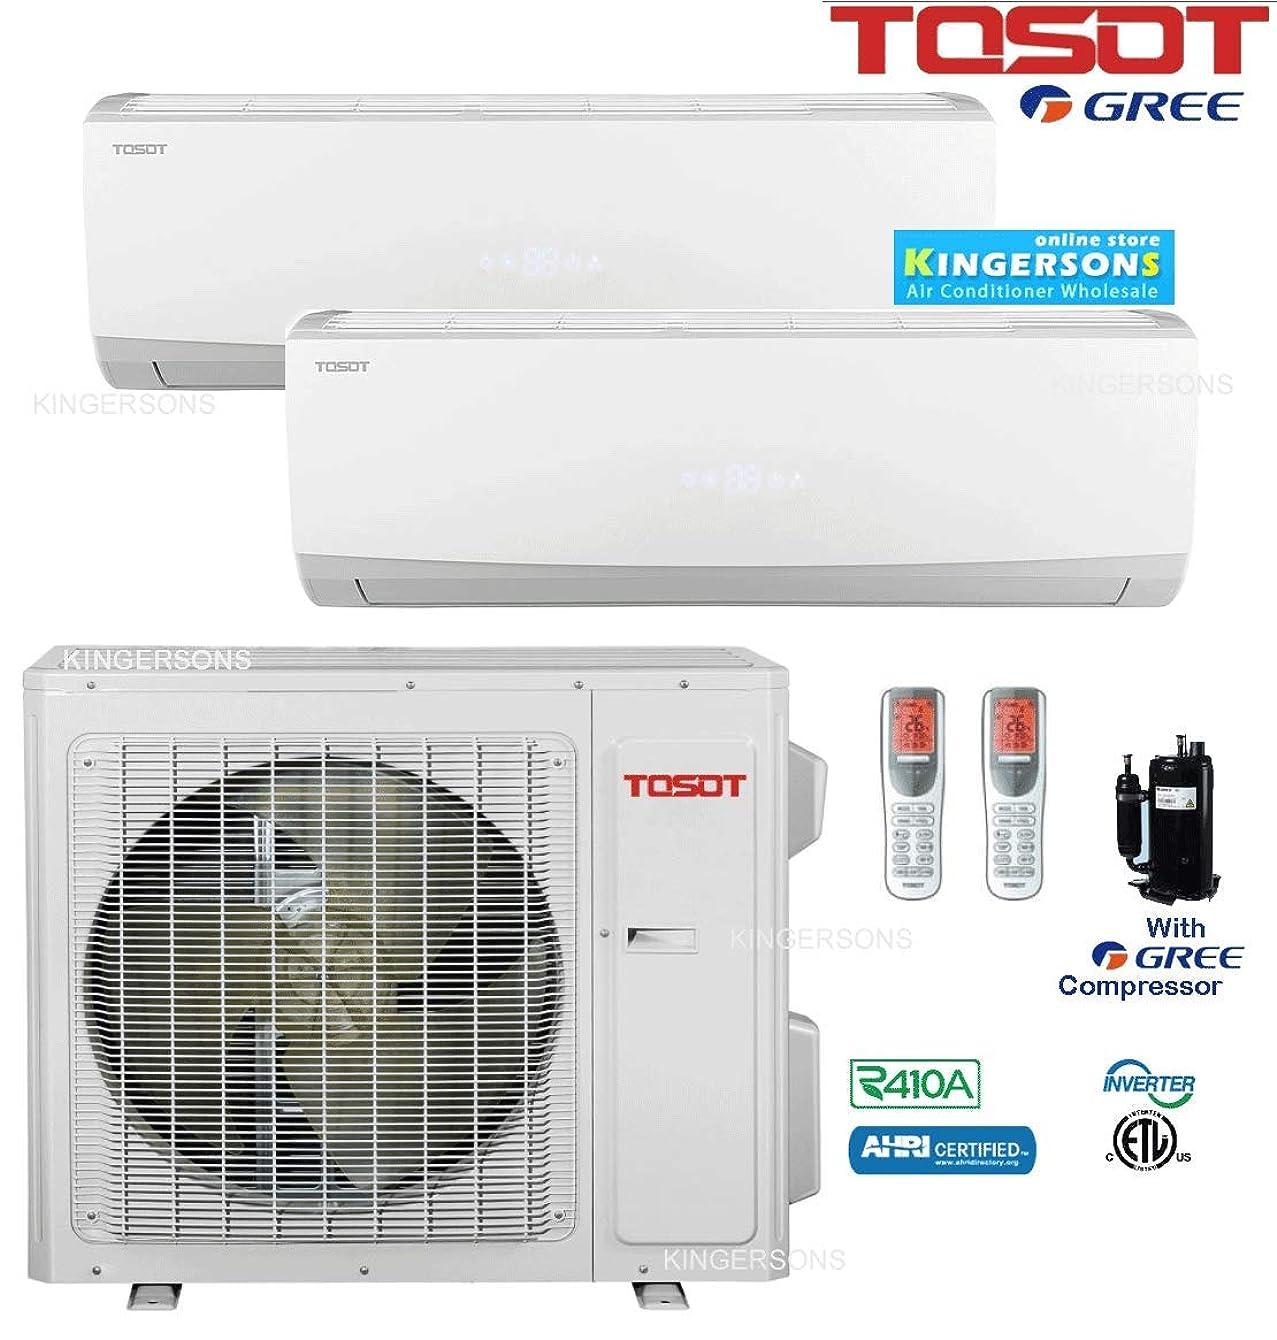 TOSOT GREE Dual Zone Split AIR Conditioner 21,000 BTU with 12,000 Btu x 9,000 BTU Wall Unit SEER 22 Energy Star Toshiba Compressor